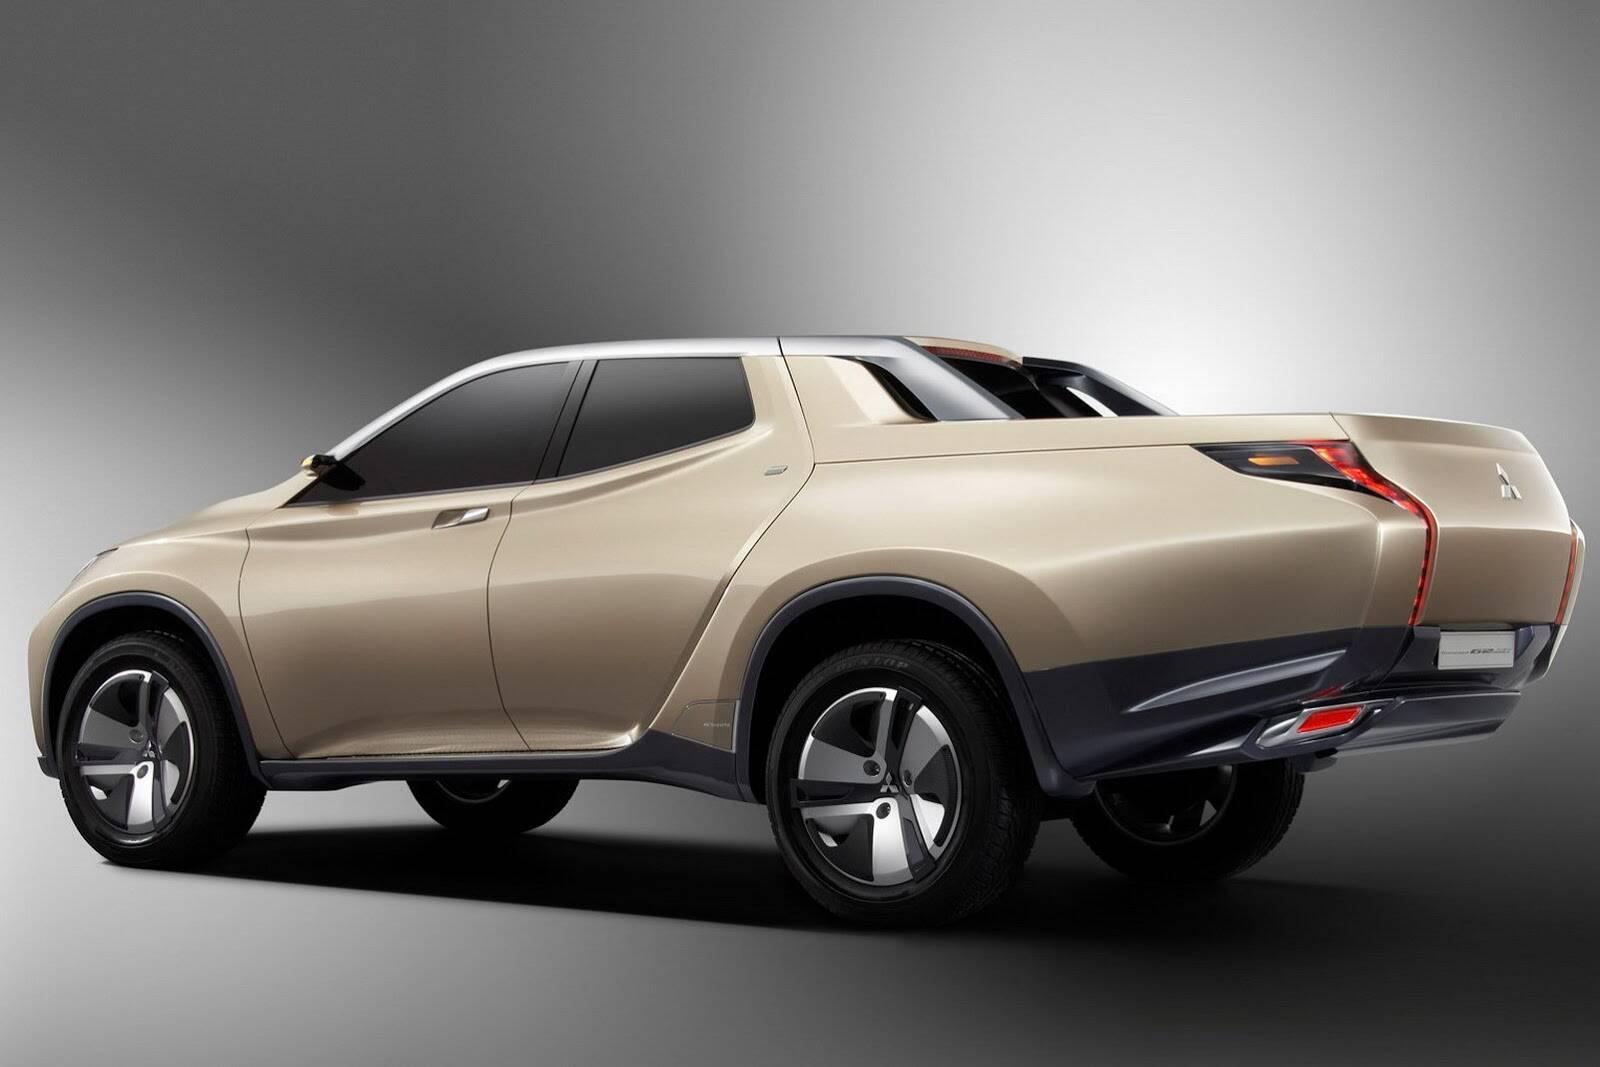 Mitsubishi L200 Triton. Foto: Reprodução/Ferd